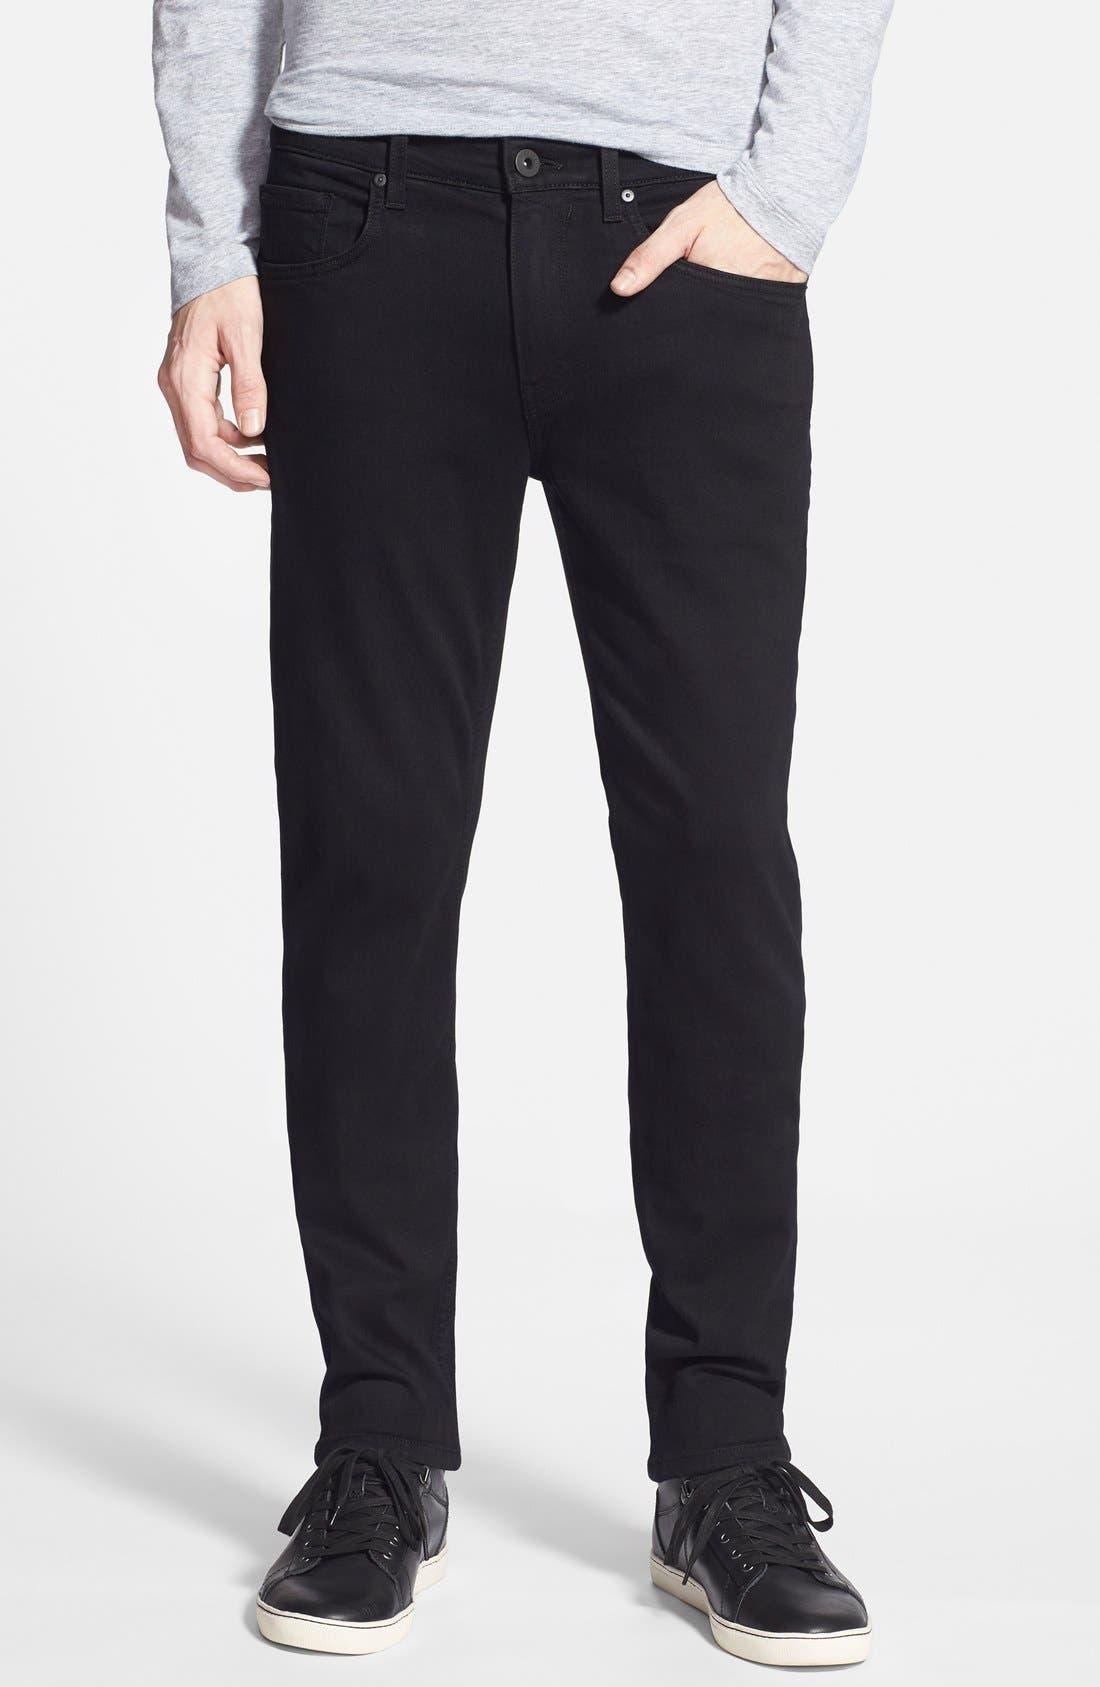 PAIGE Transcend - Lennox XL Slim Fit Jeans (Black Shadow) (Tall)